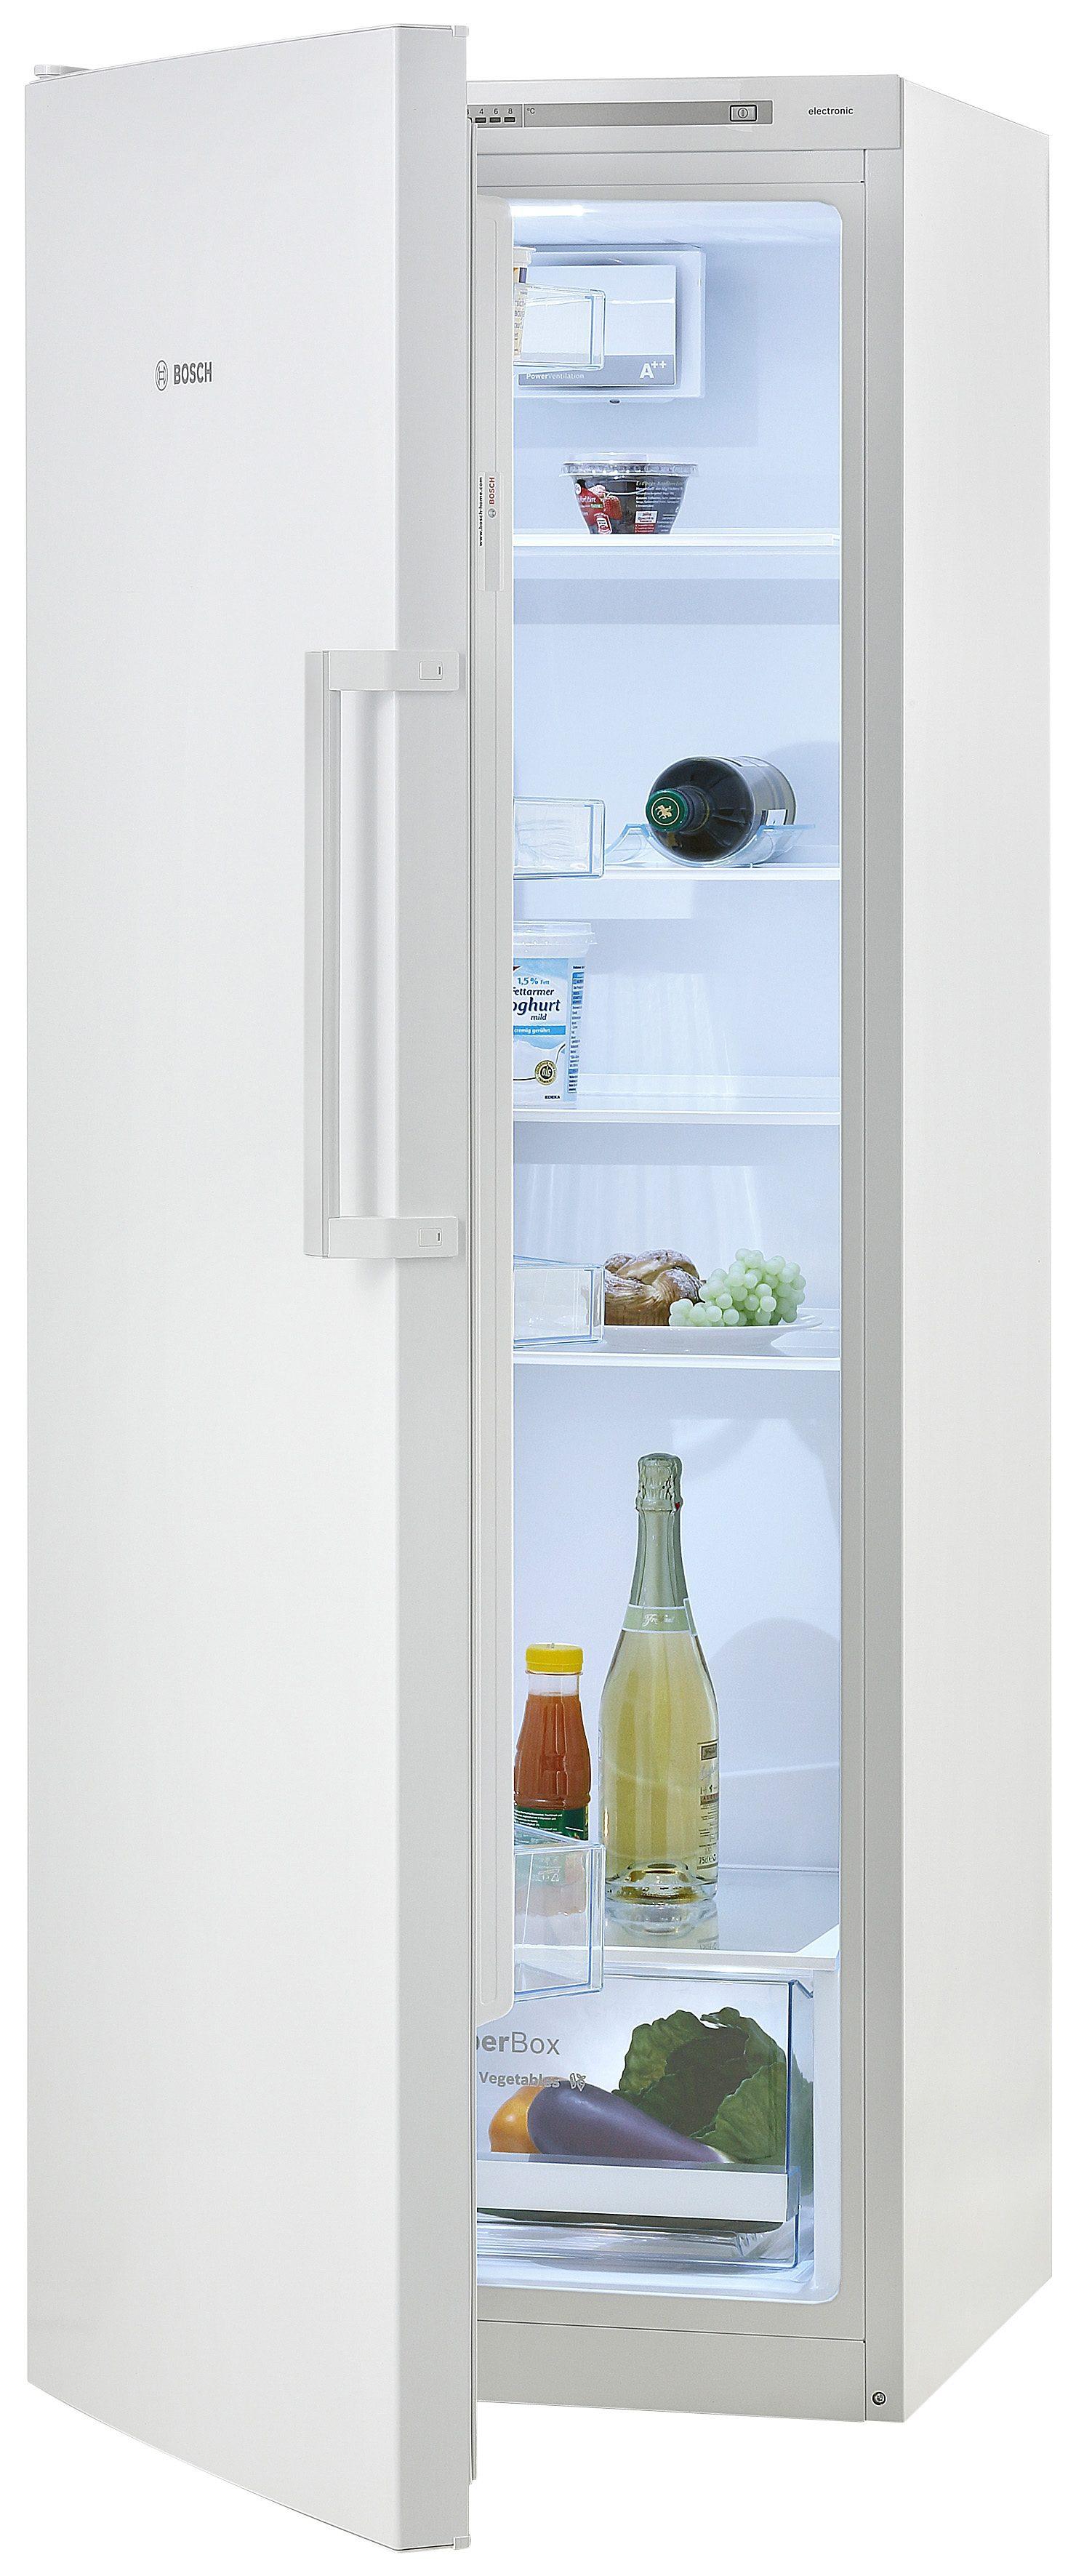 Bosch Kühlschrank KSV29NW30, A++, 161 cm hoch